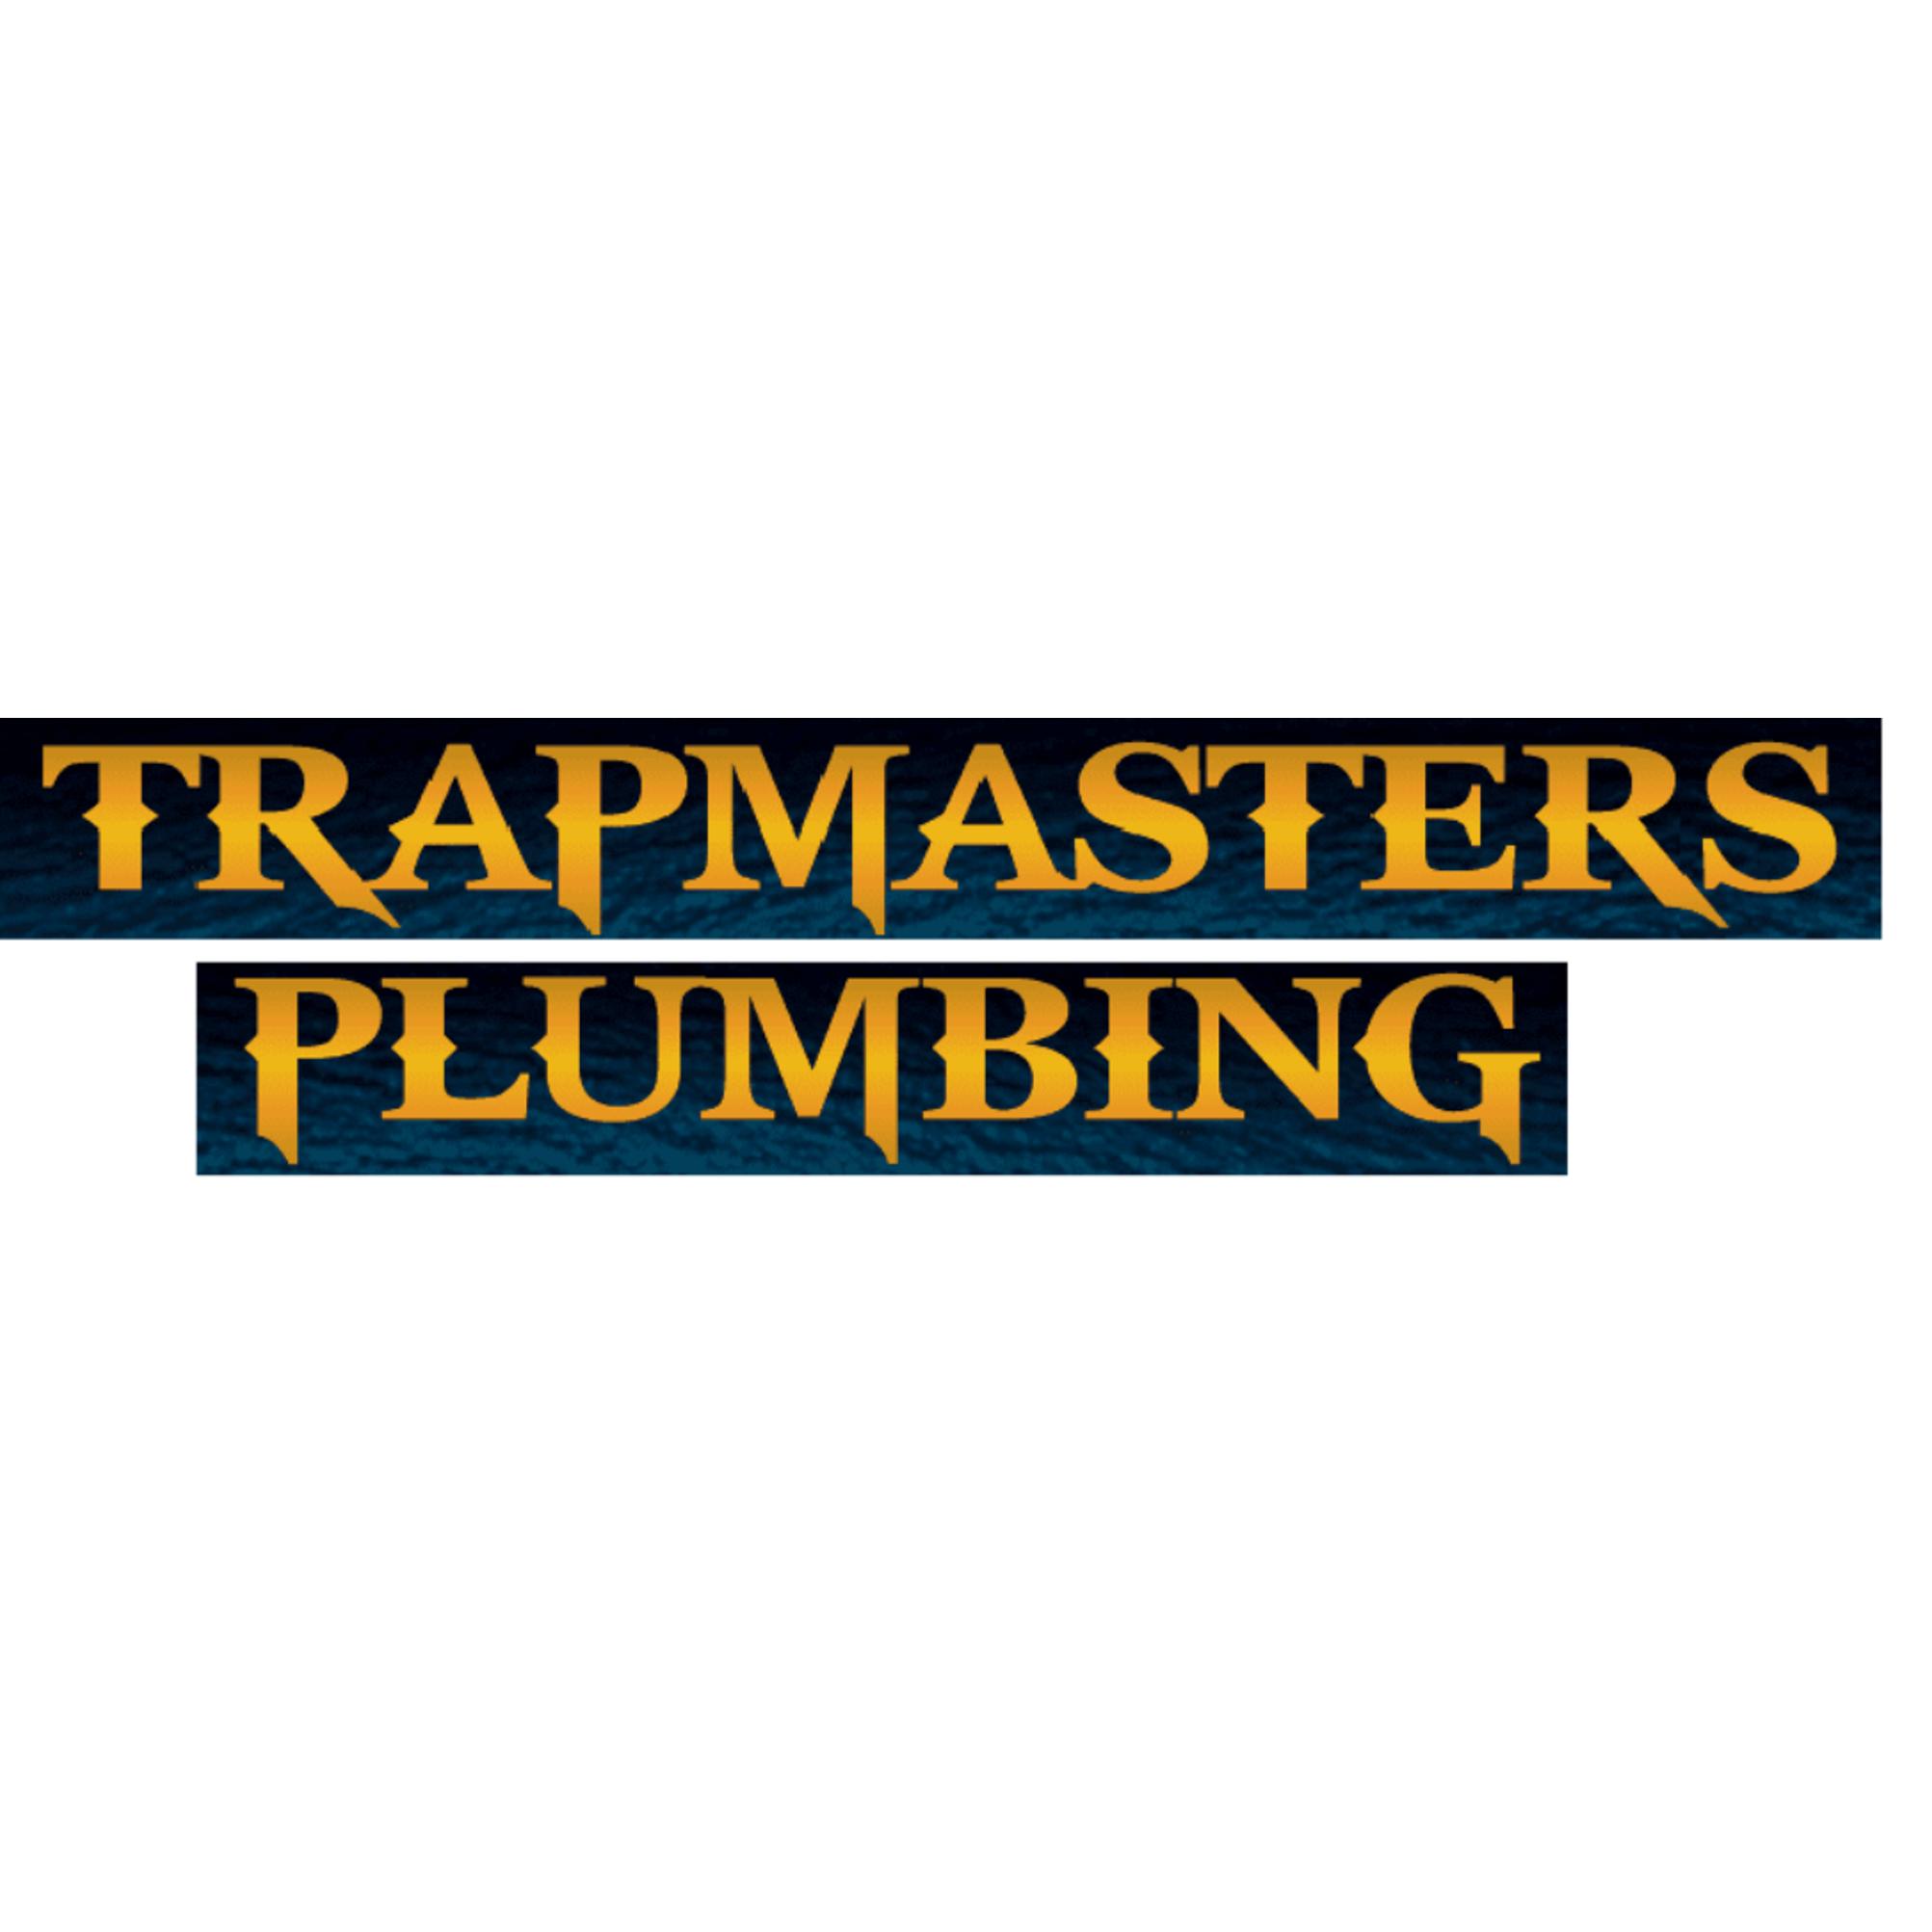 Trapmasters Plumbing LLC